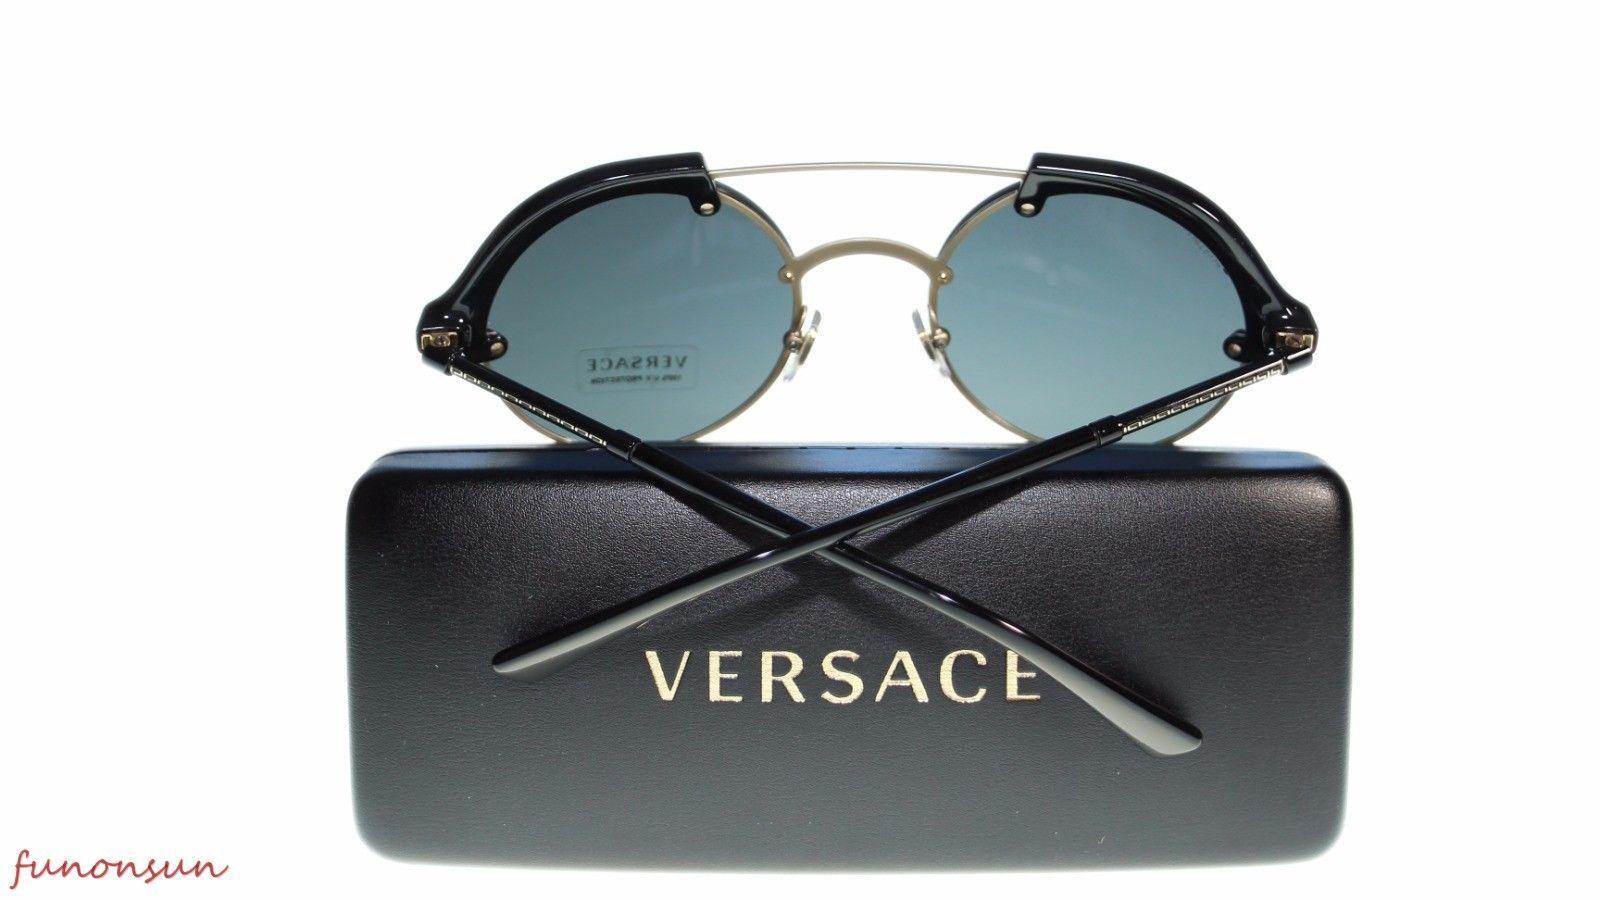 Versace  Women's Sunglasses VE4337 GB187 Gold/Black Gray Lens 53mm